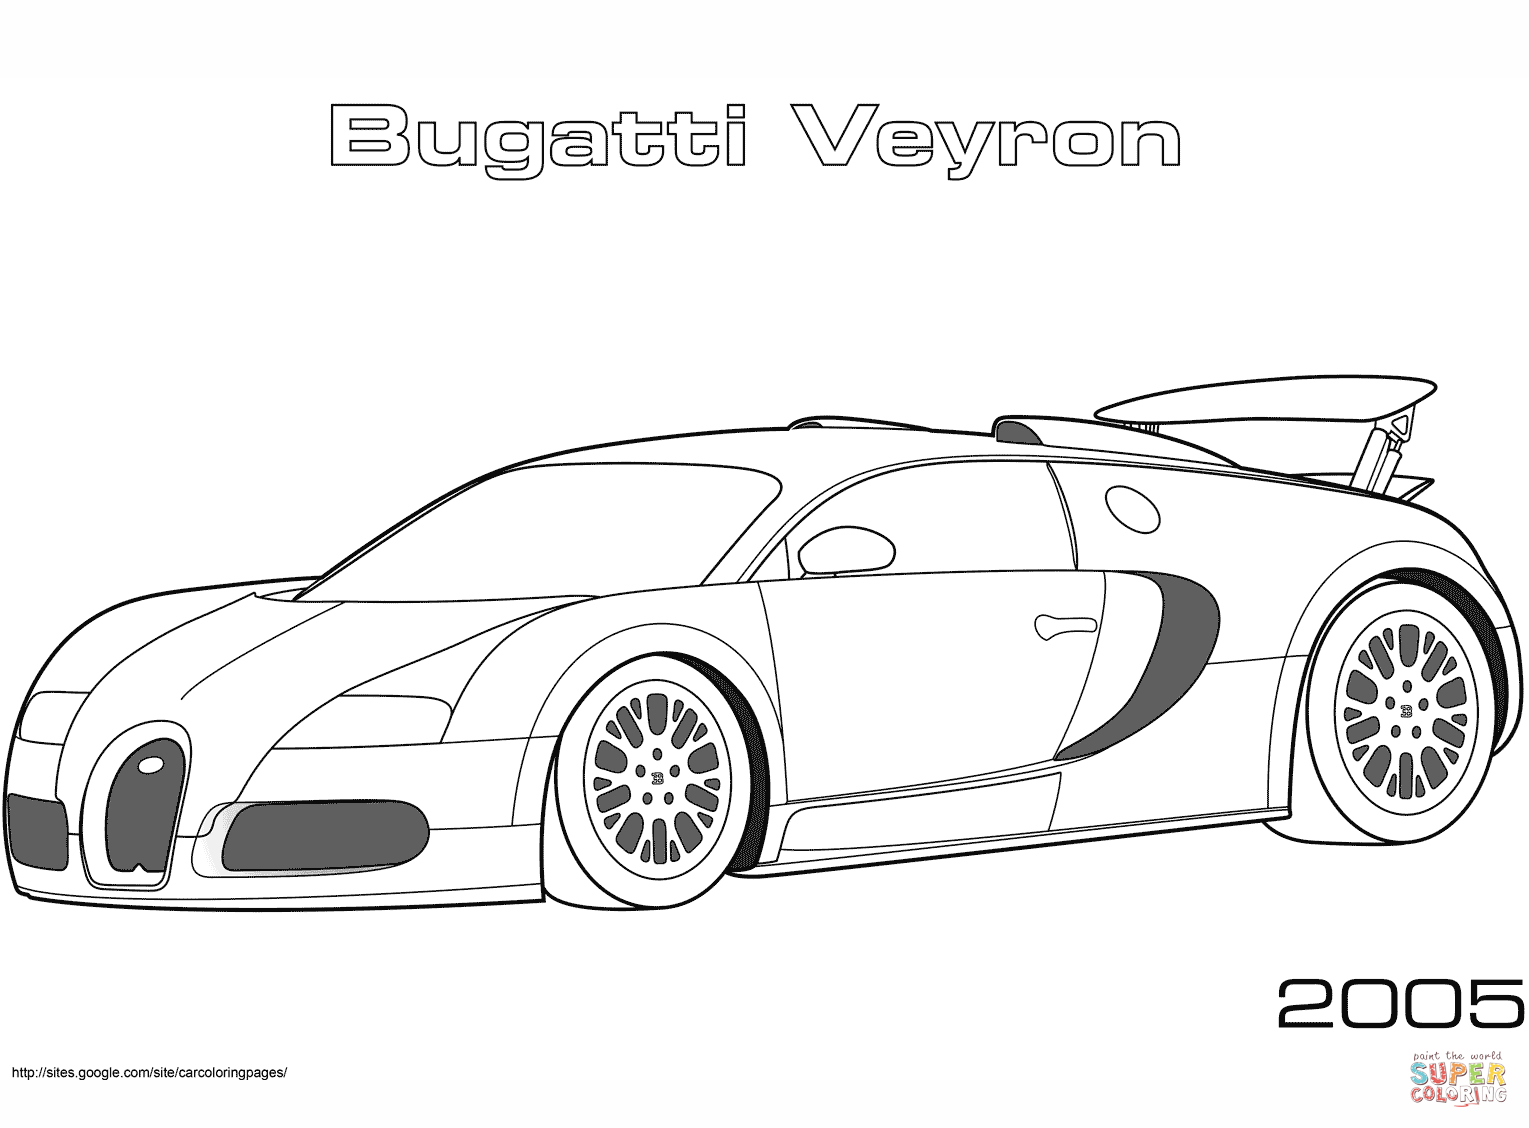 2005 Bugatti Veyron coloring page.